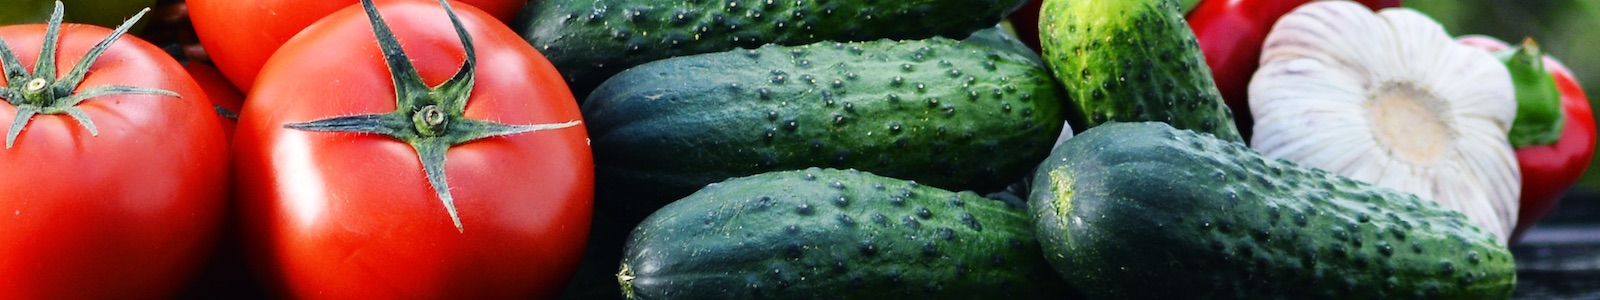 Eating Organic Food